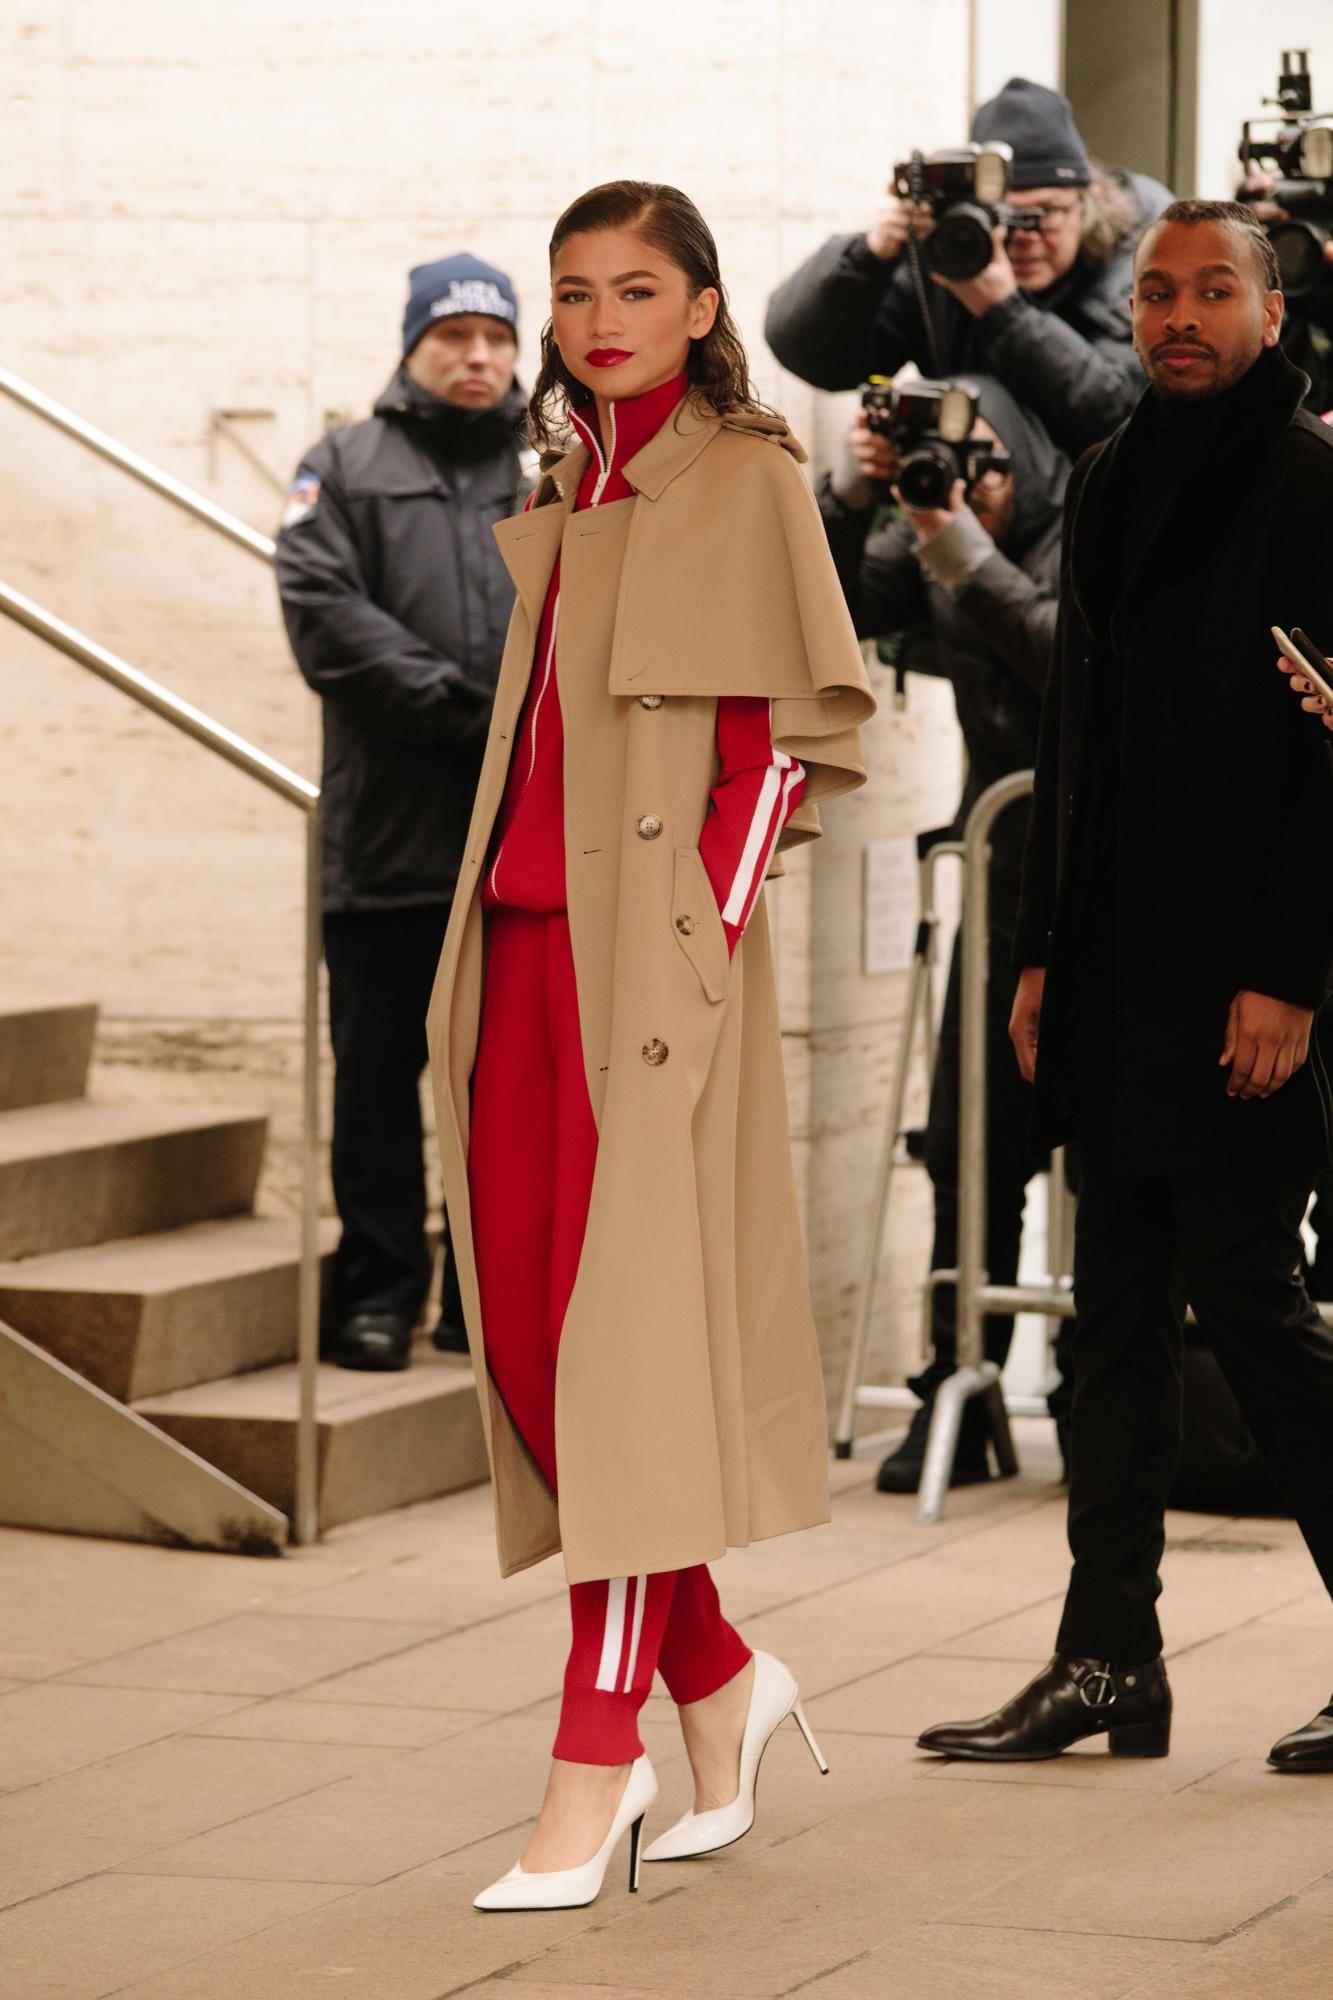 Pretty chic at New York Fashion Week advise